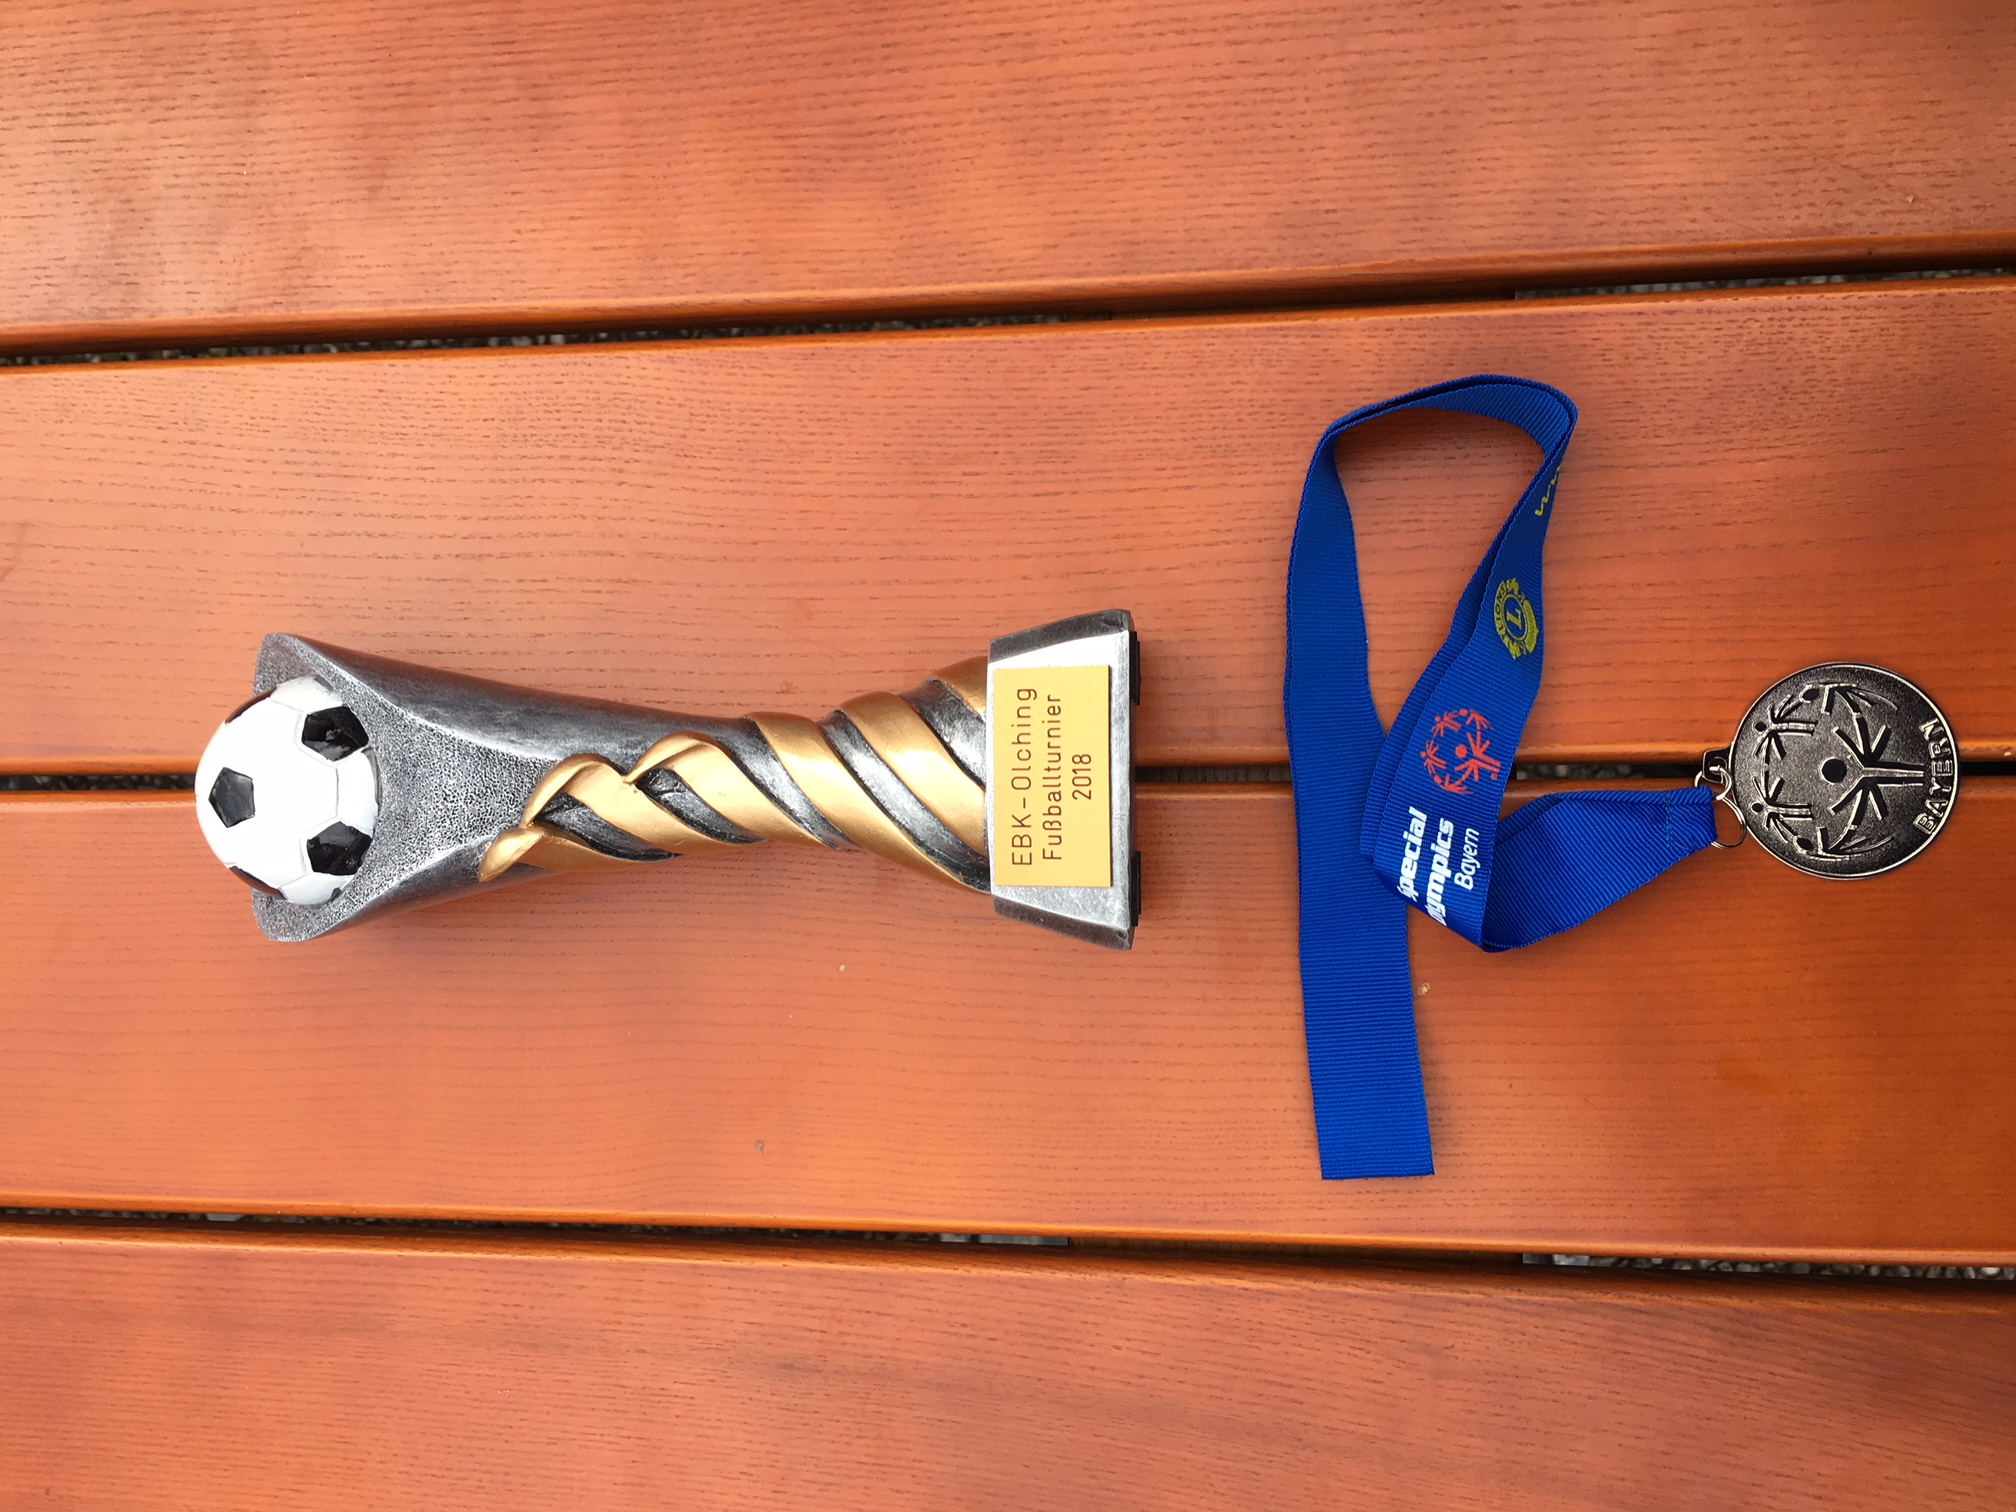 Starke Leistung: Kader der Moritzberg-Werkstätten belegte beim Turnier in Olching Platz 2. 14 Mannschaften traten an.